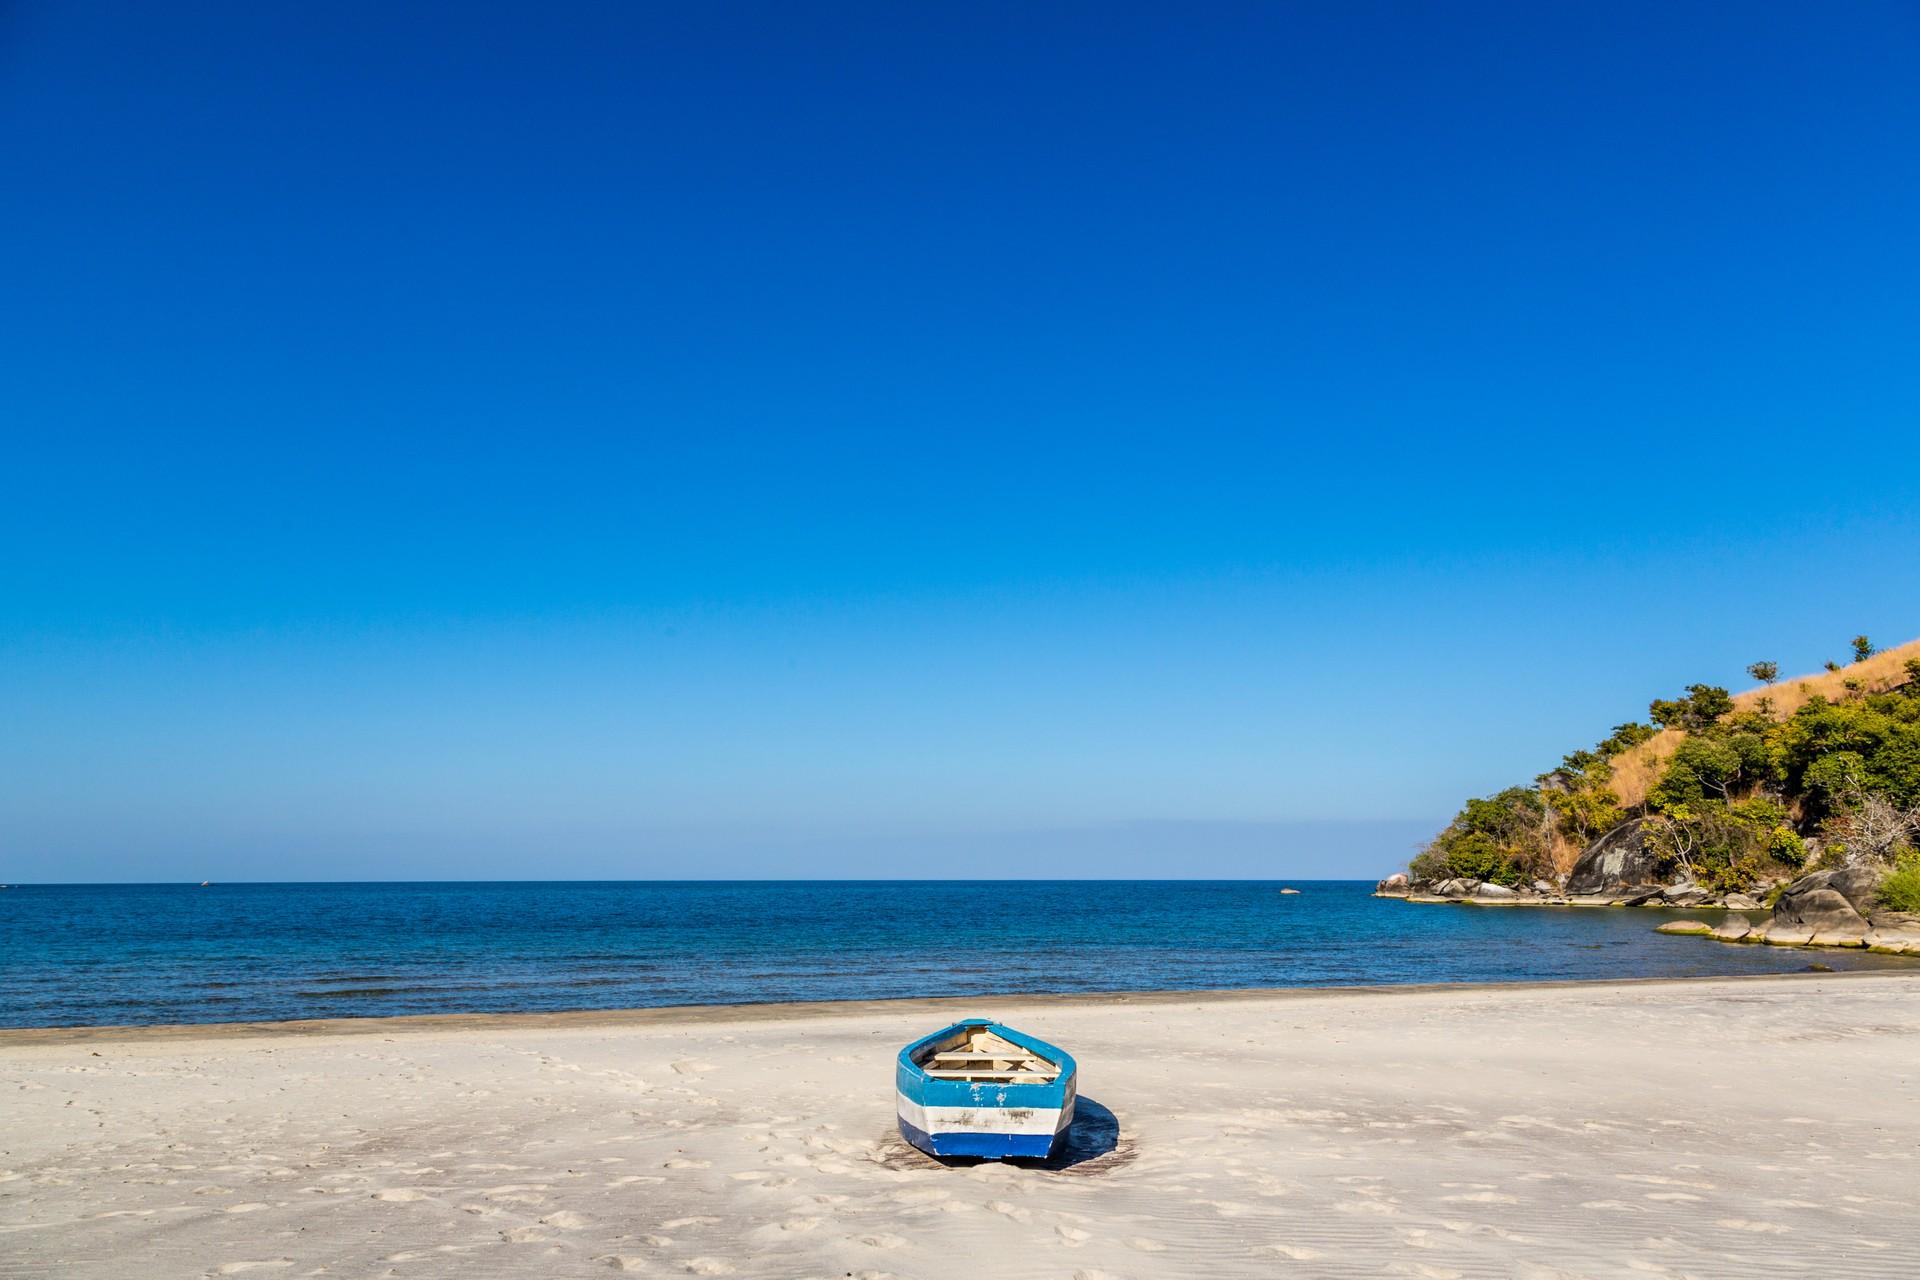 Boat on the shore of Lake Malawi